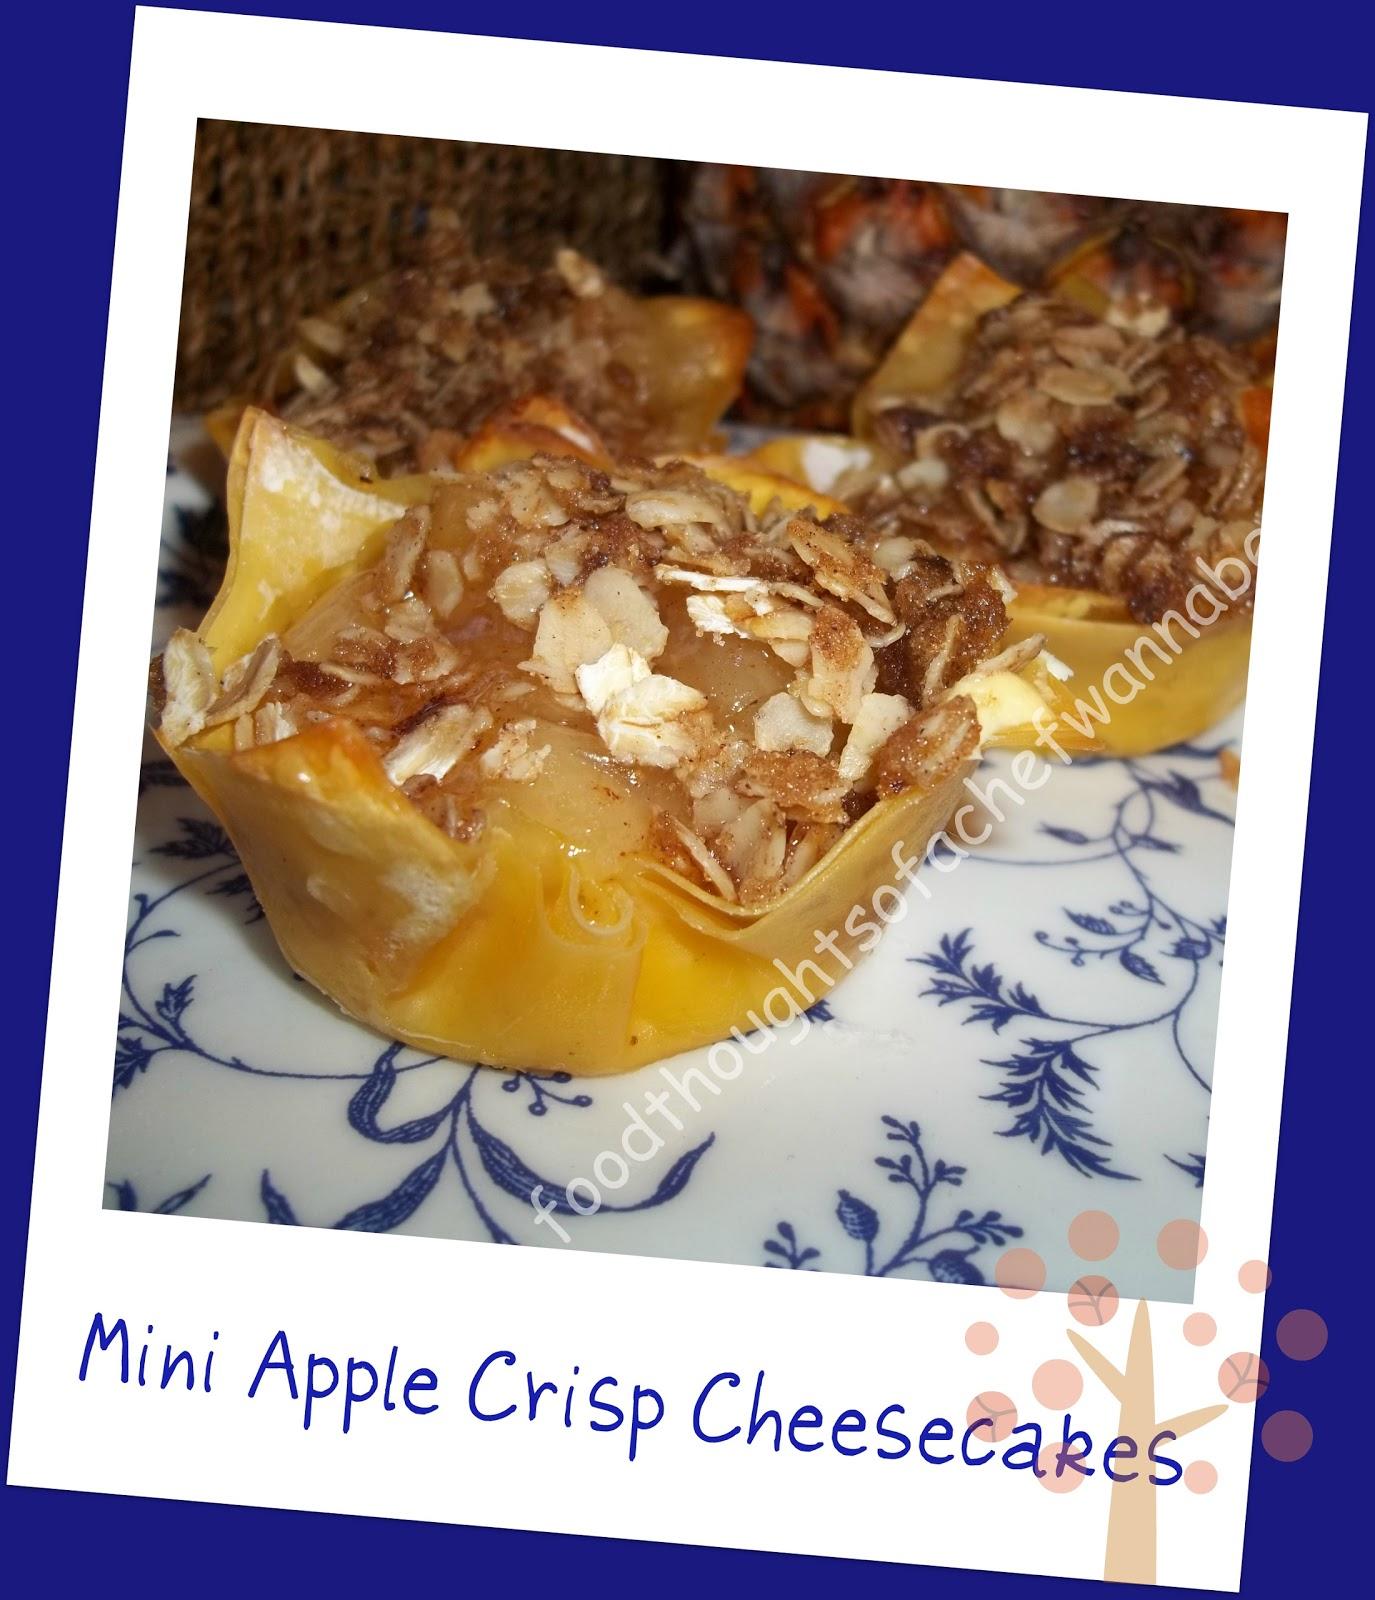 FoodThoughtsOfaChefWannabe: Mini Apple Crisp Cheesecakes